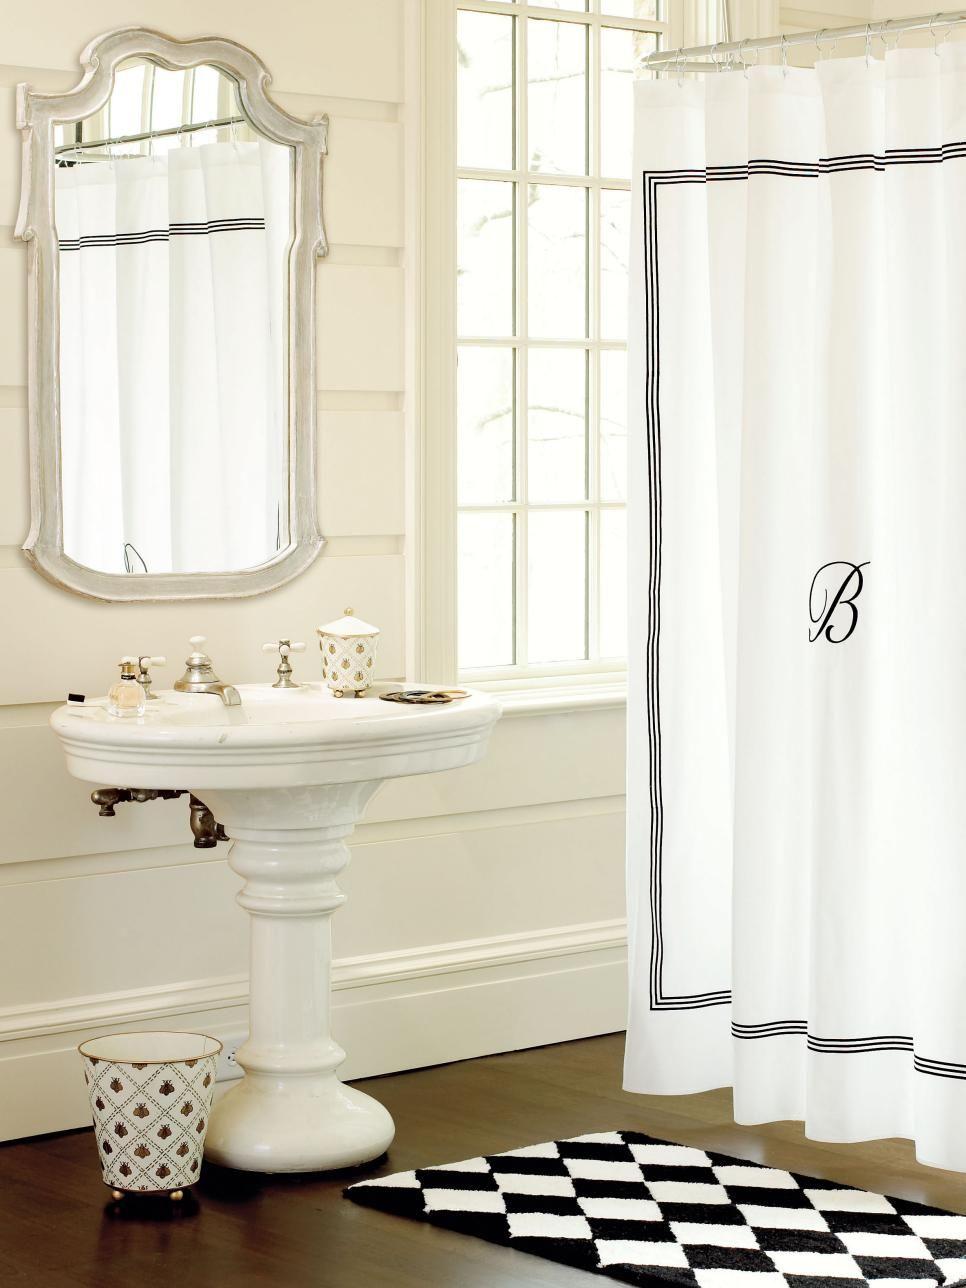 A Monogrammed Shower Curtain By Ballard Designs Adds A Personal